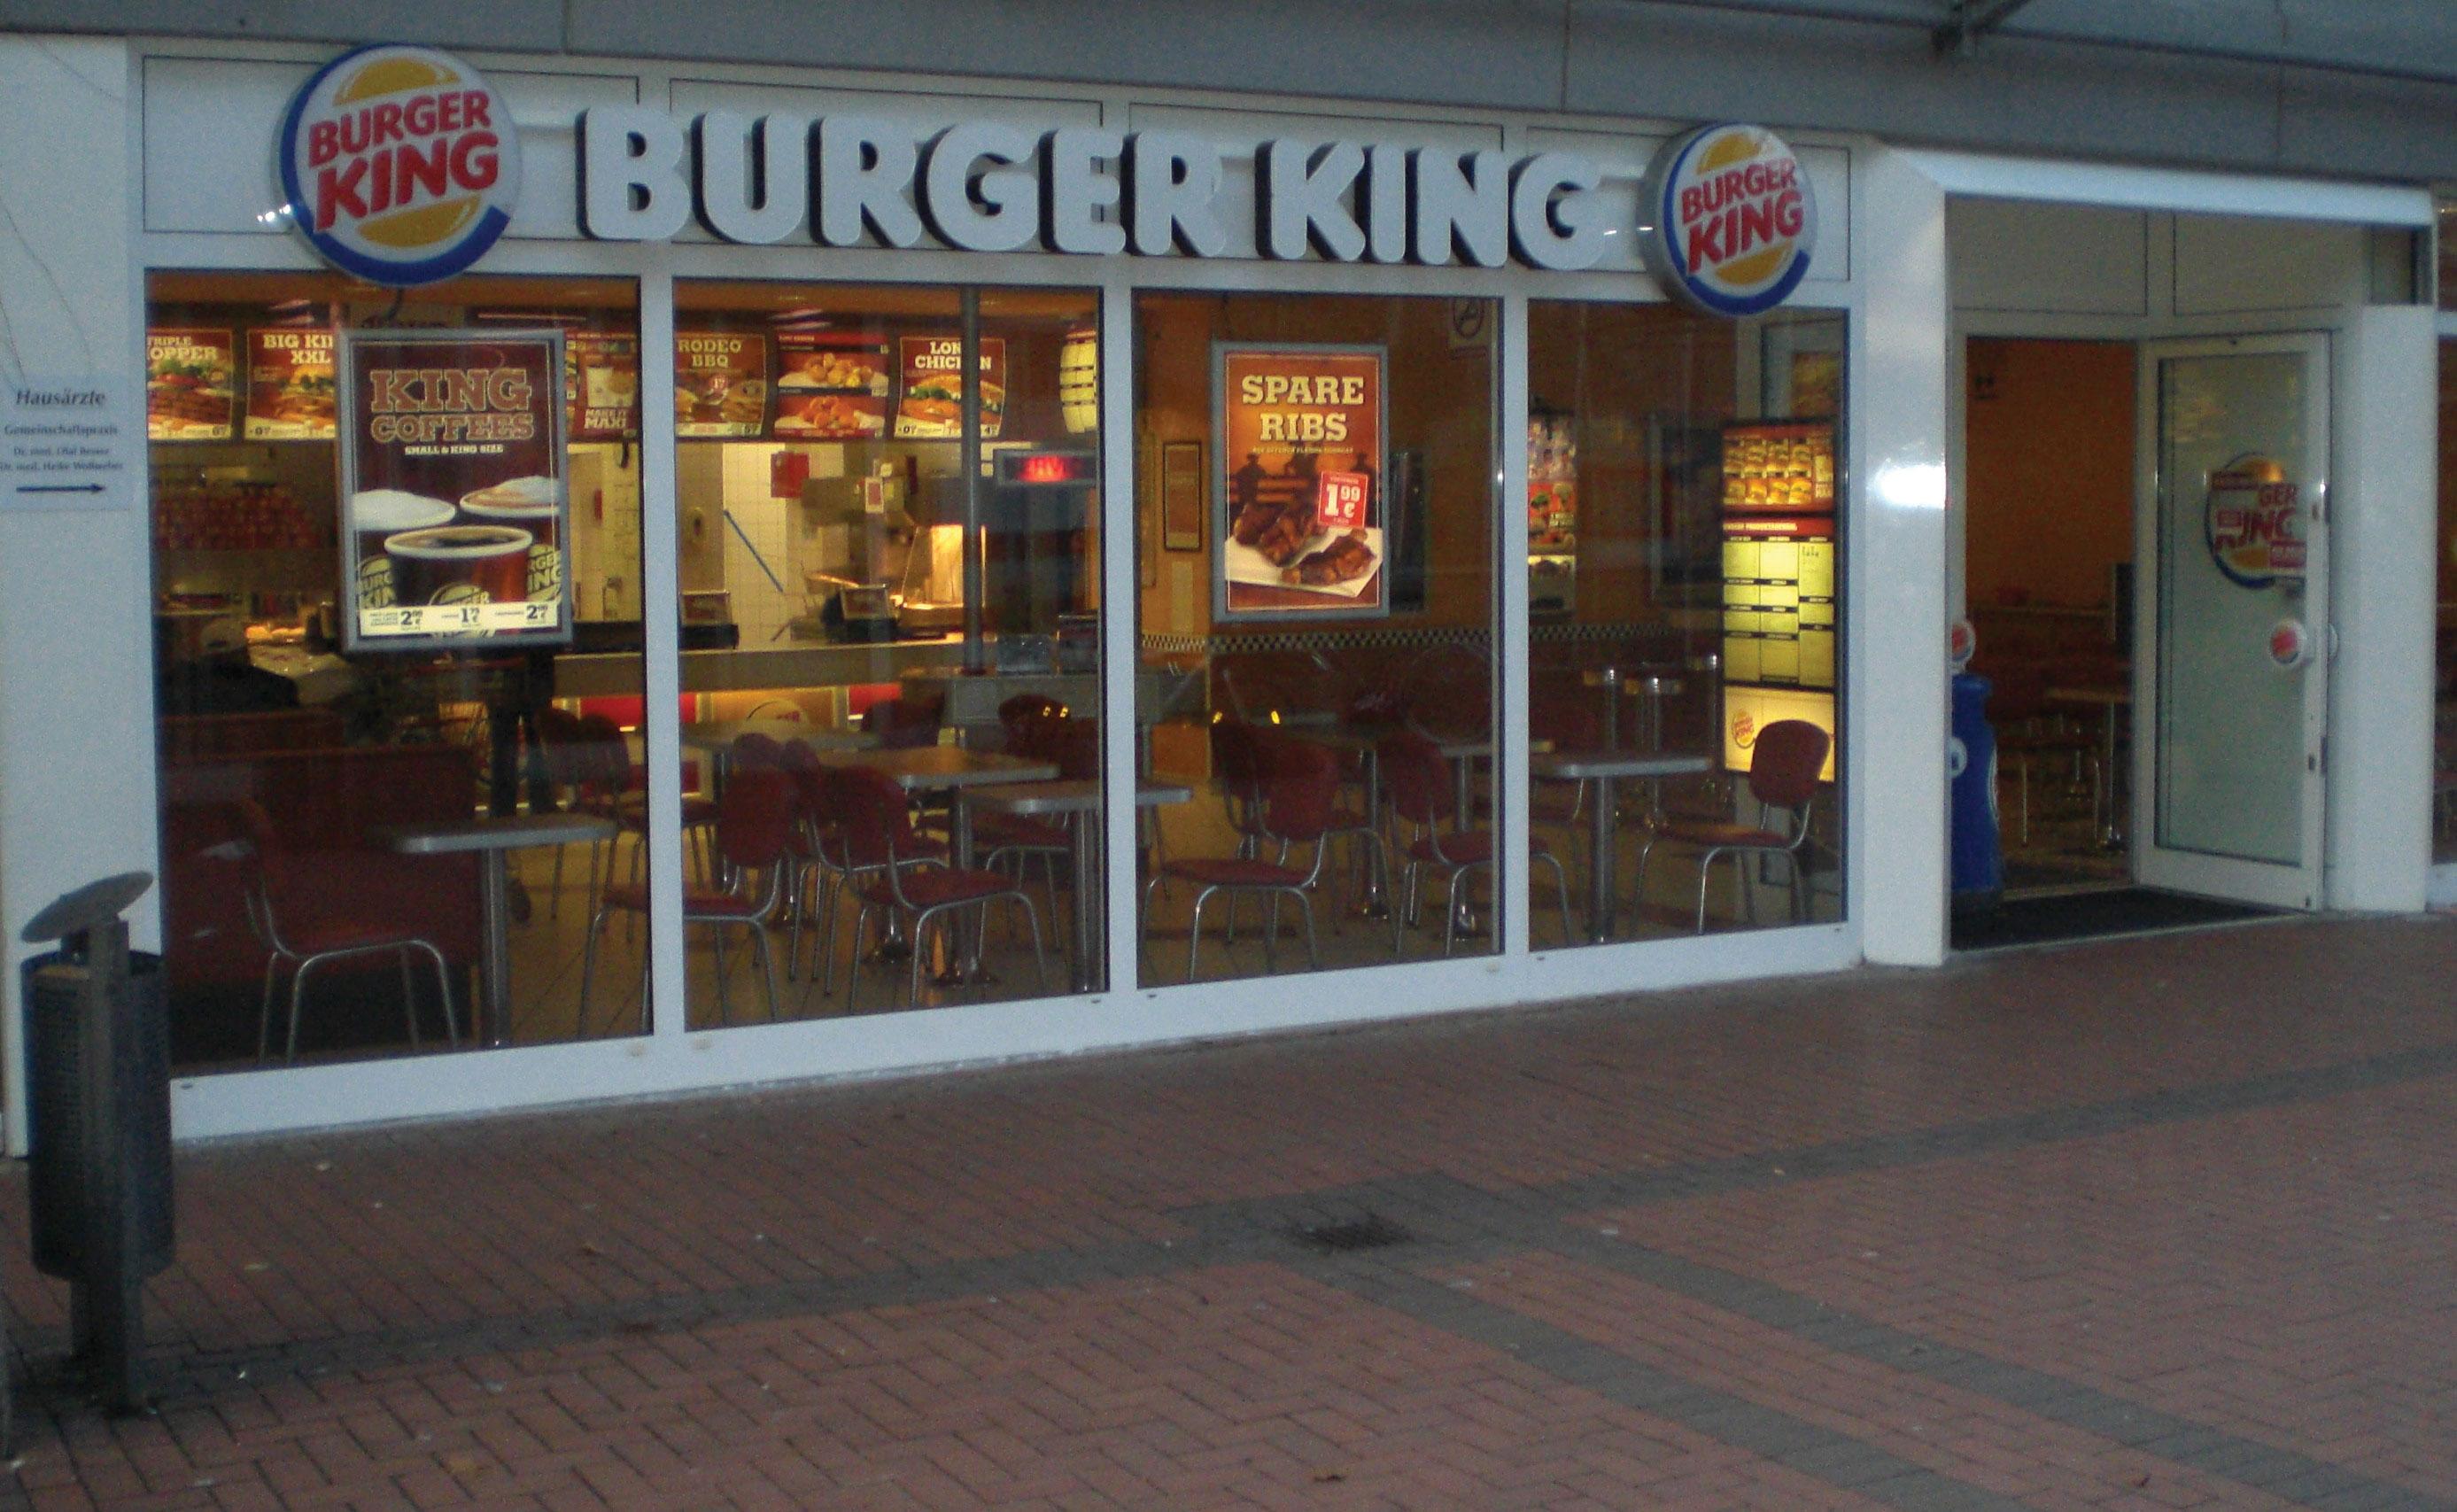 fast food restaurant operations